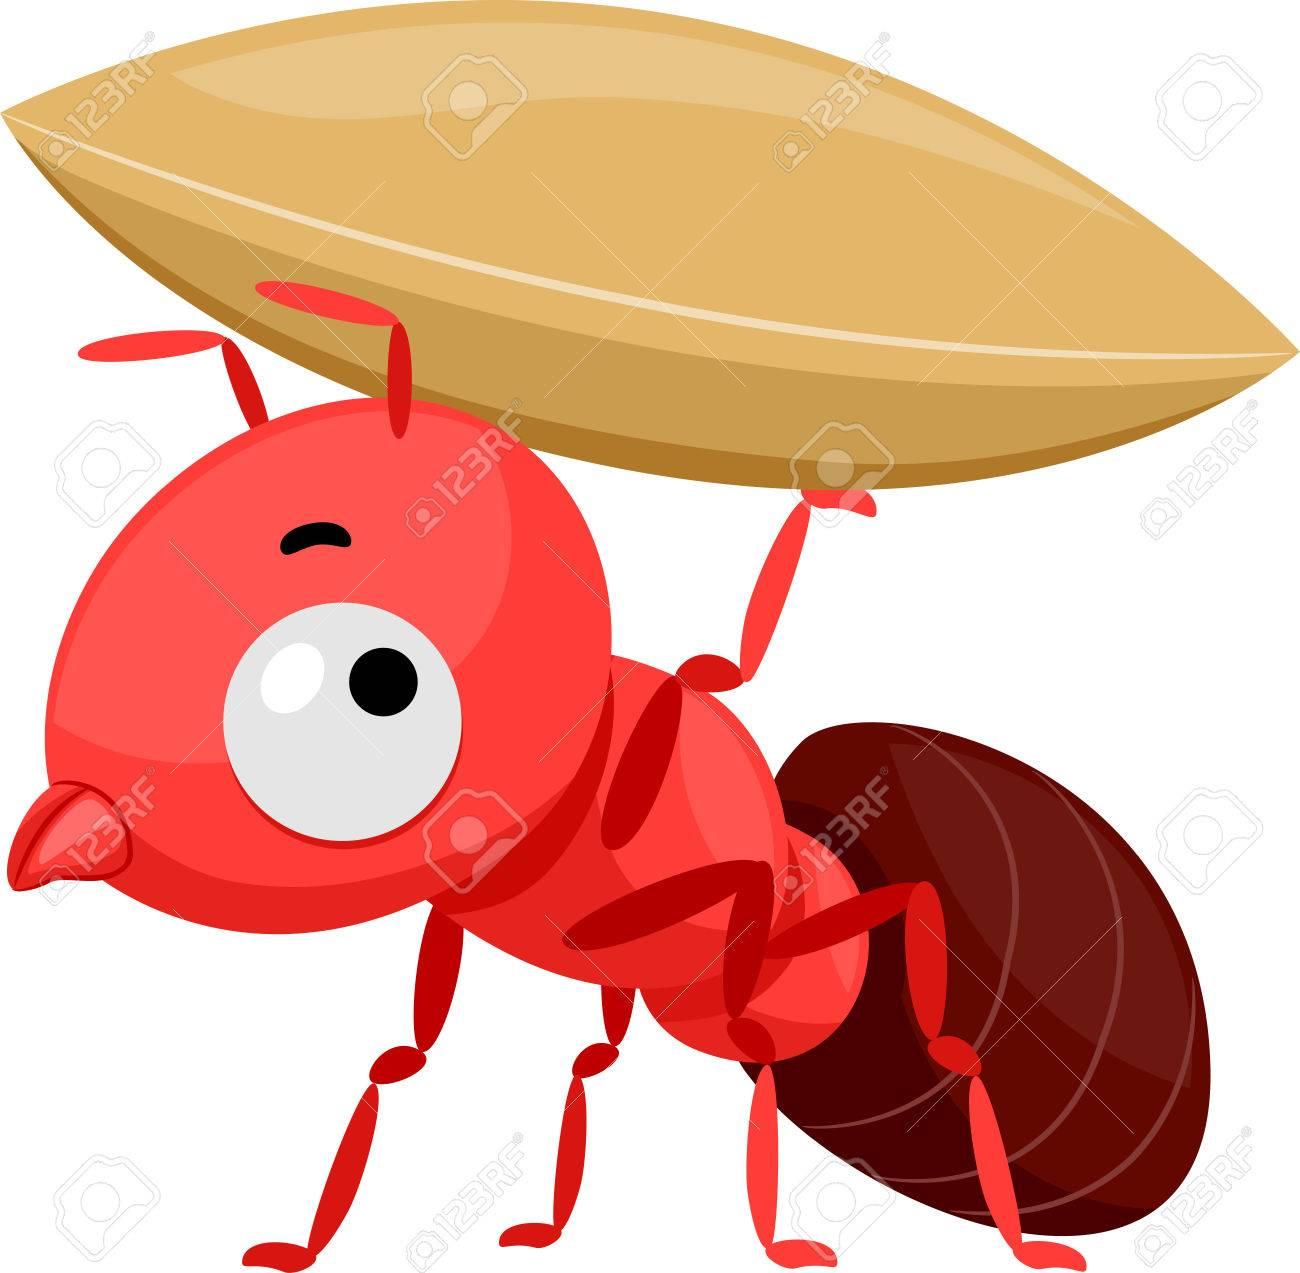 Ejemplo De La Mascota Que Ofrece Una Pequeña Hormiga Roja Linda Que ...